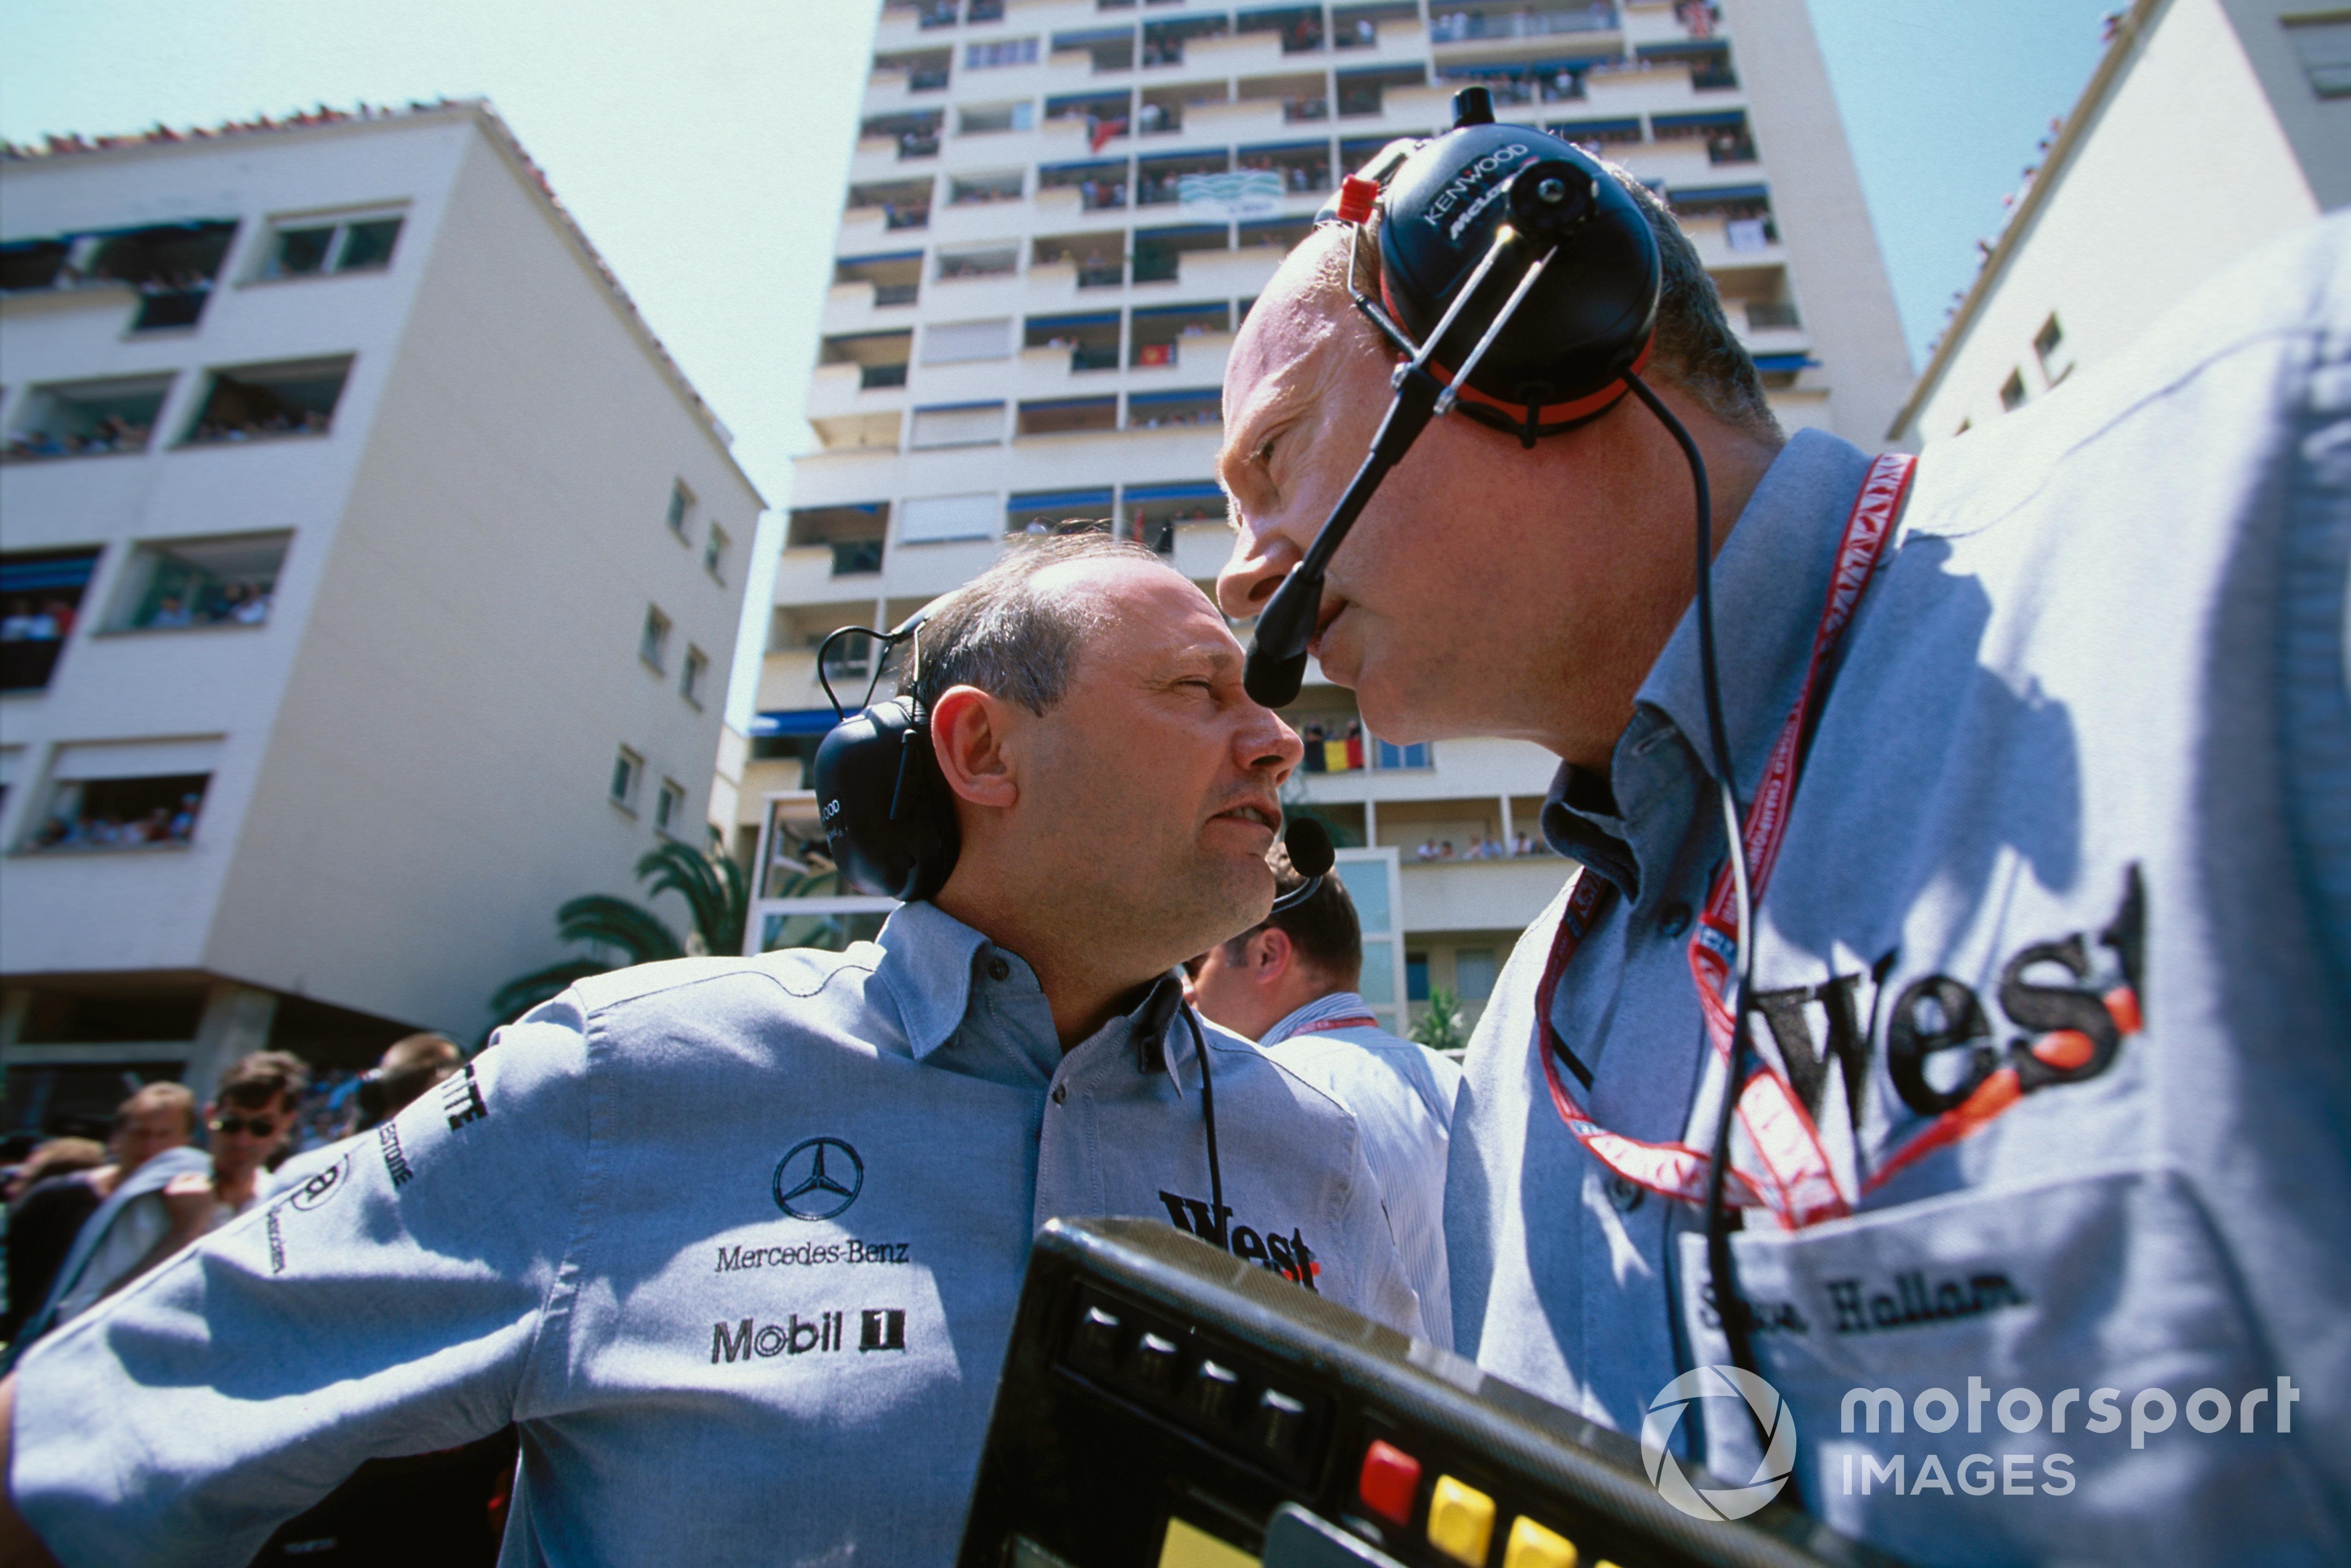 Ron Dennis and Steve Hallam. McLaren, 2001 Monaco GP